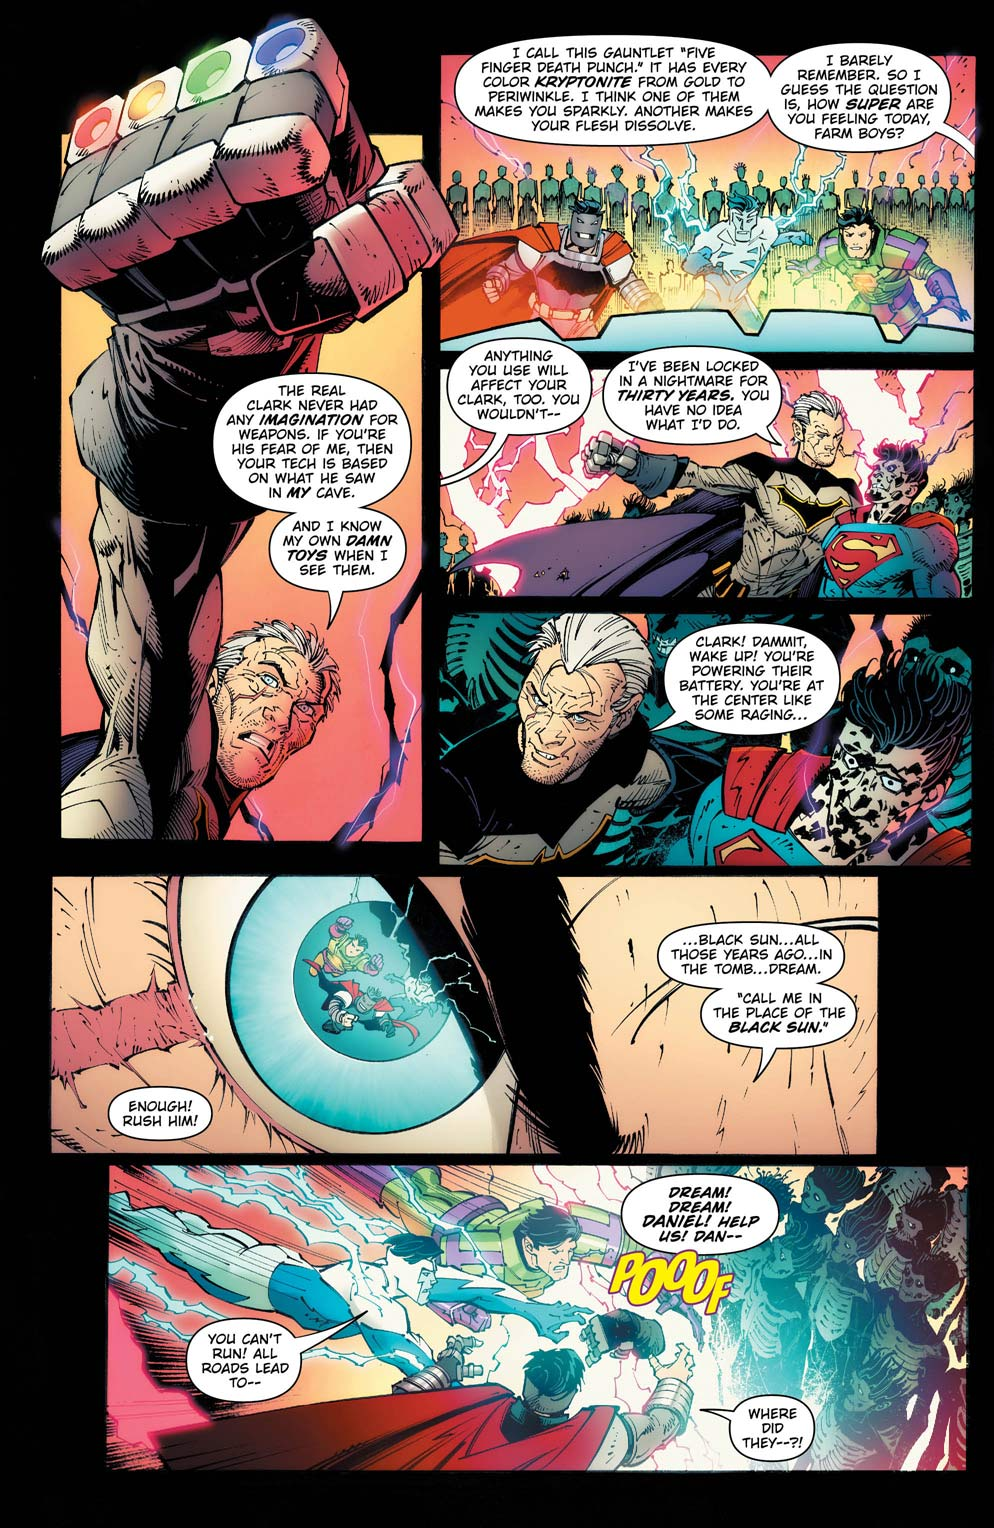 Dark Nights Metal 4_3 - DC Comics News